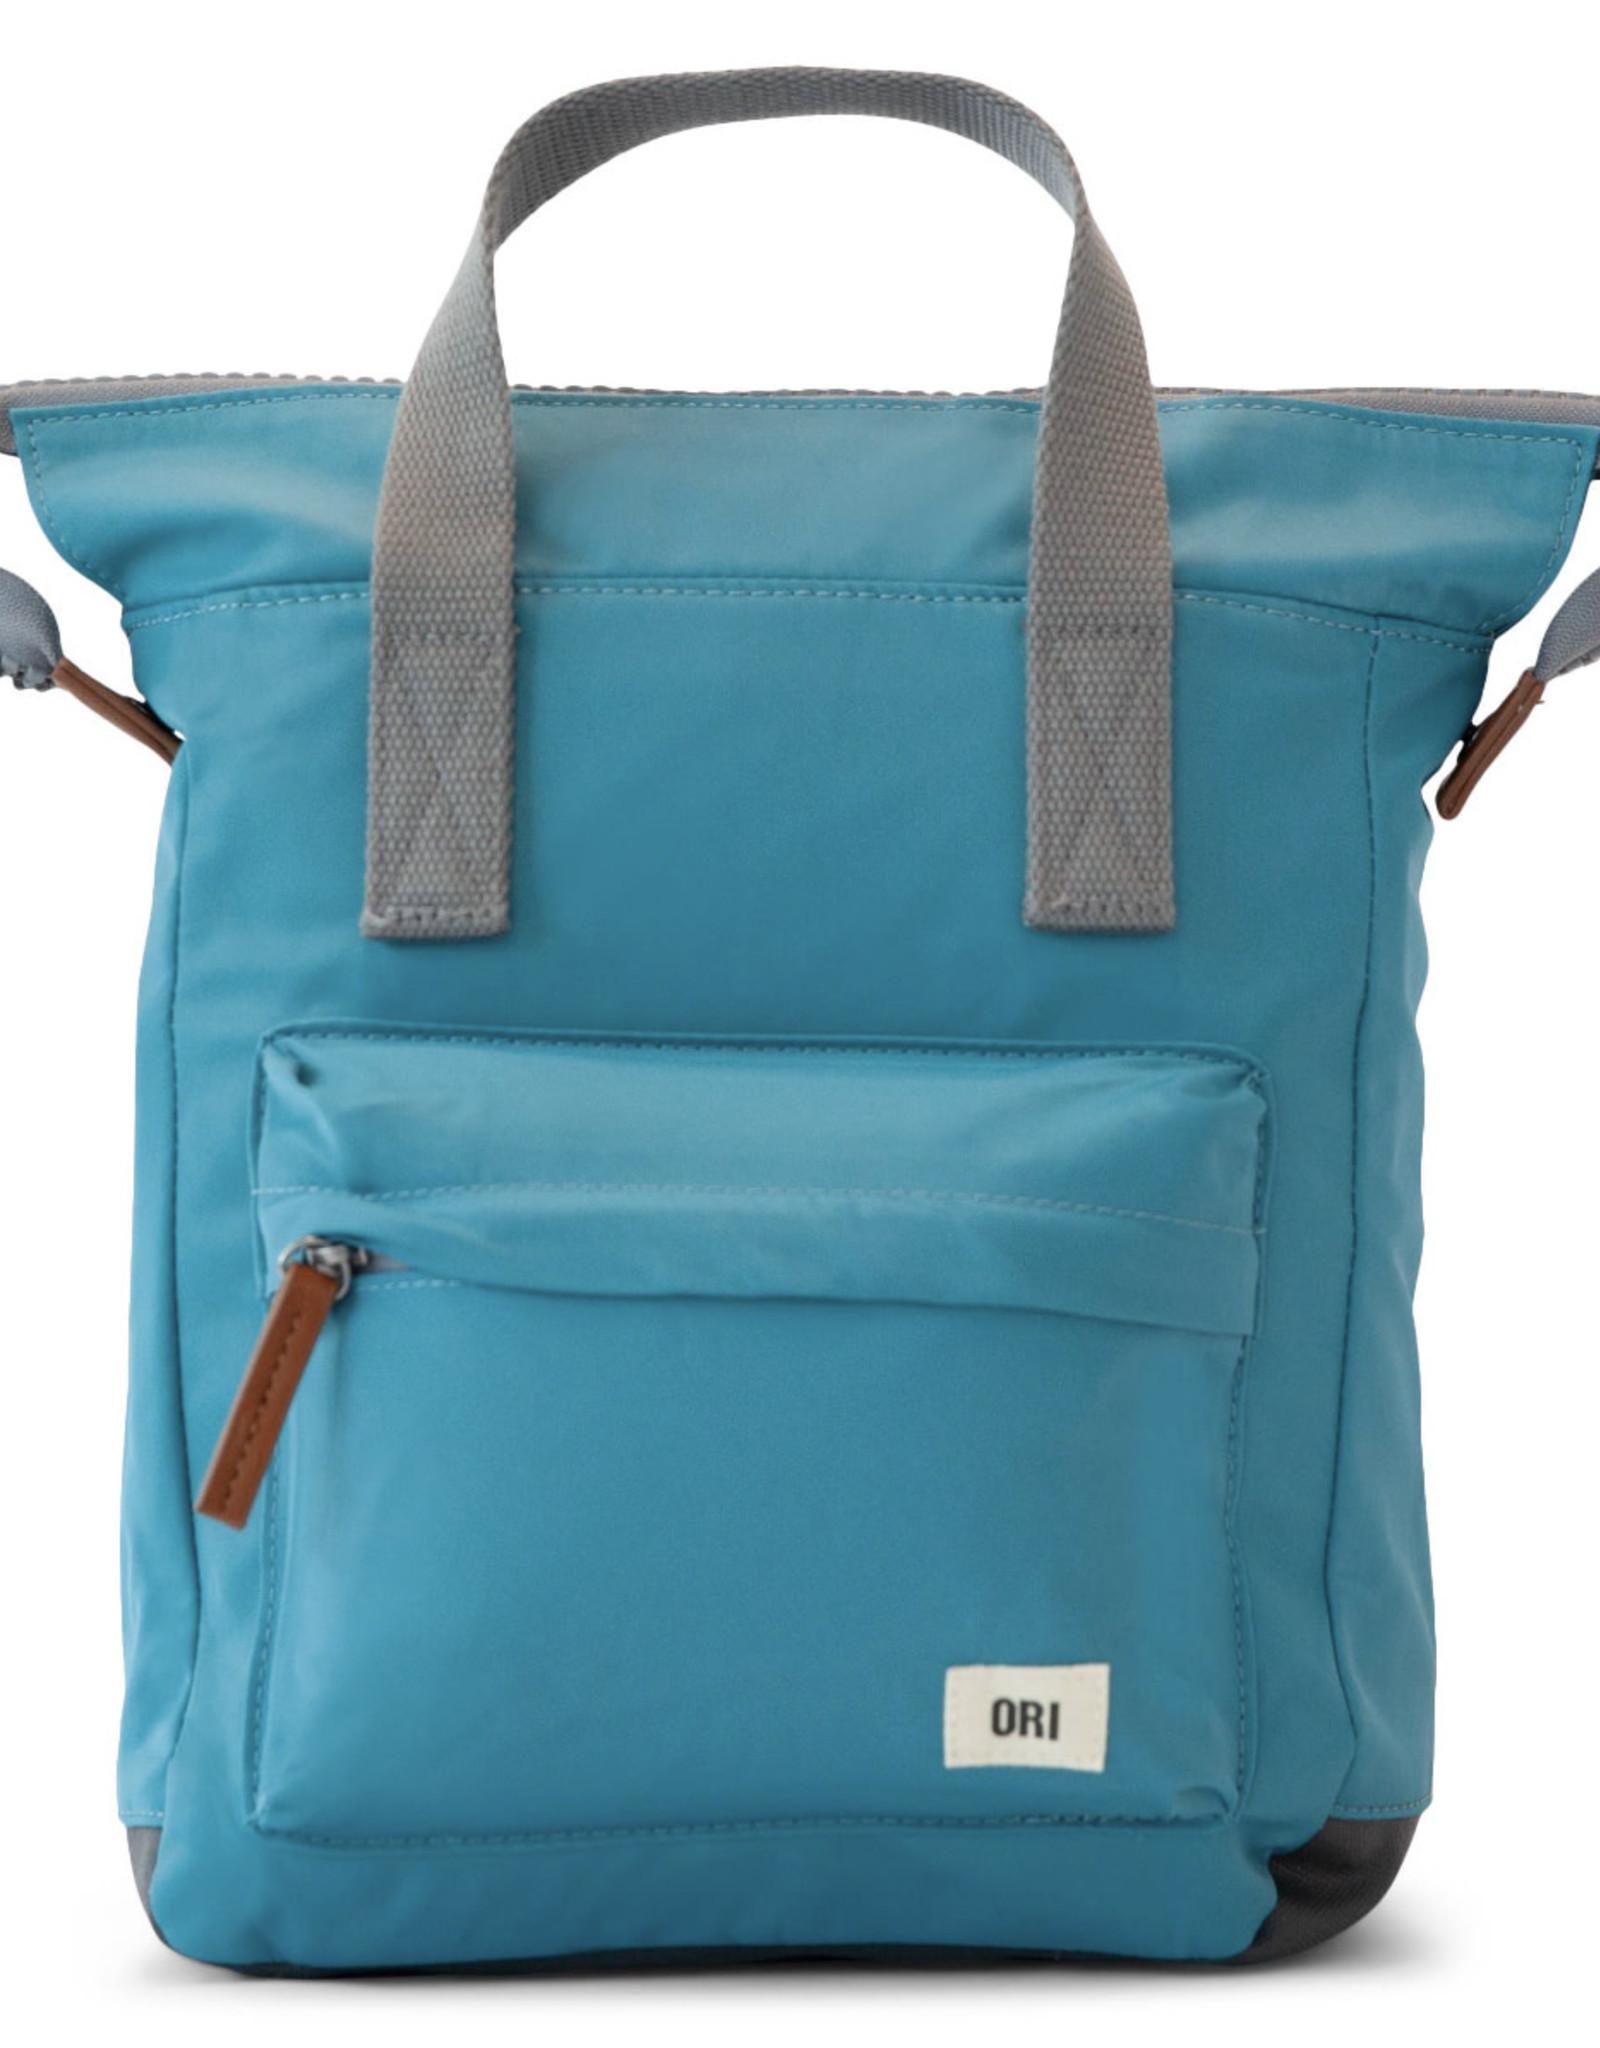 Ori London Ori Bantry B Sustainable Backpack